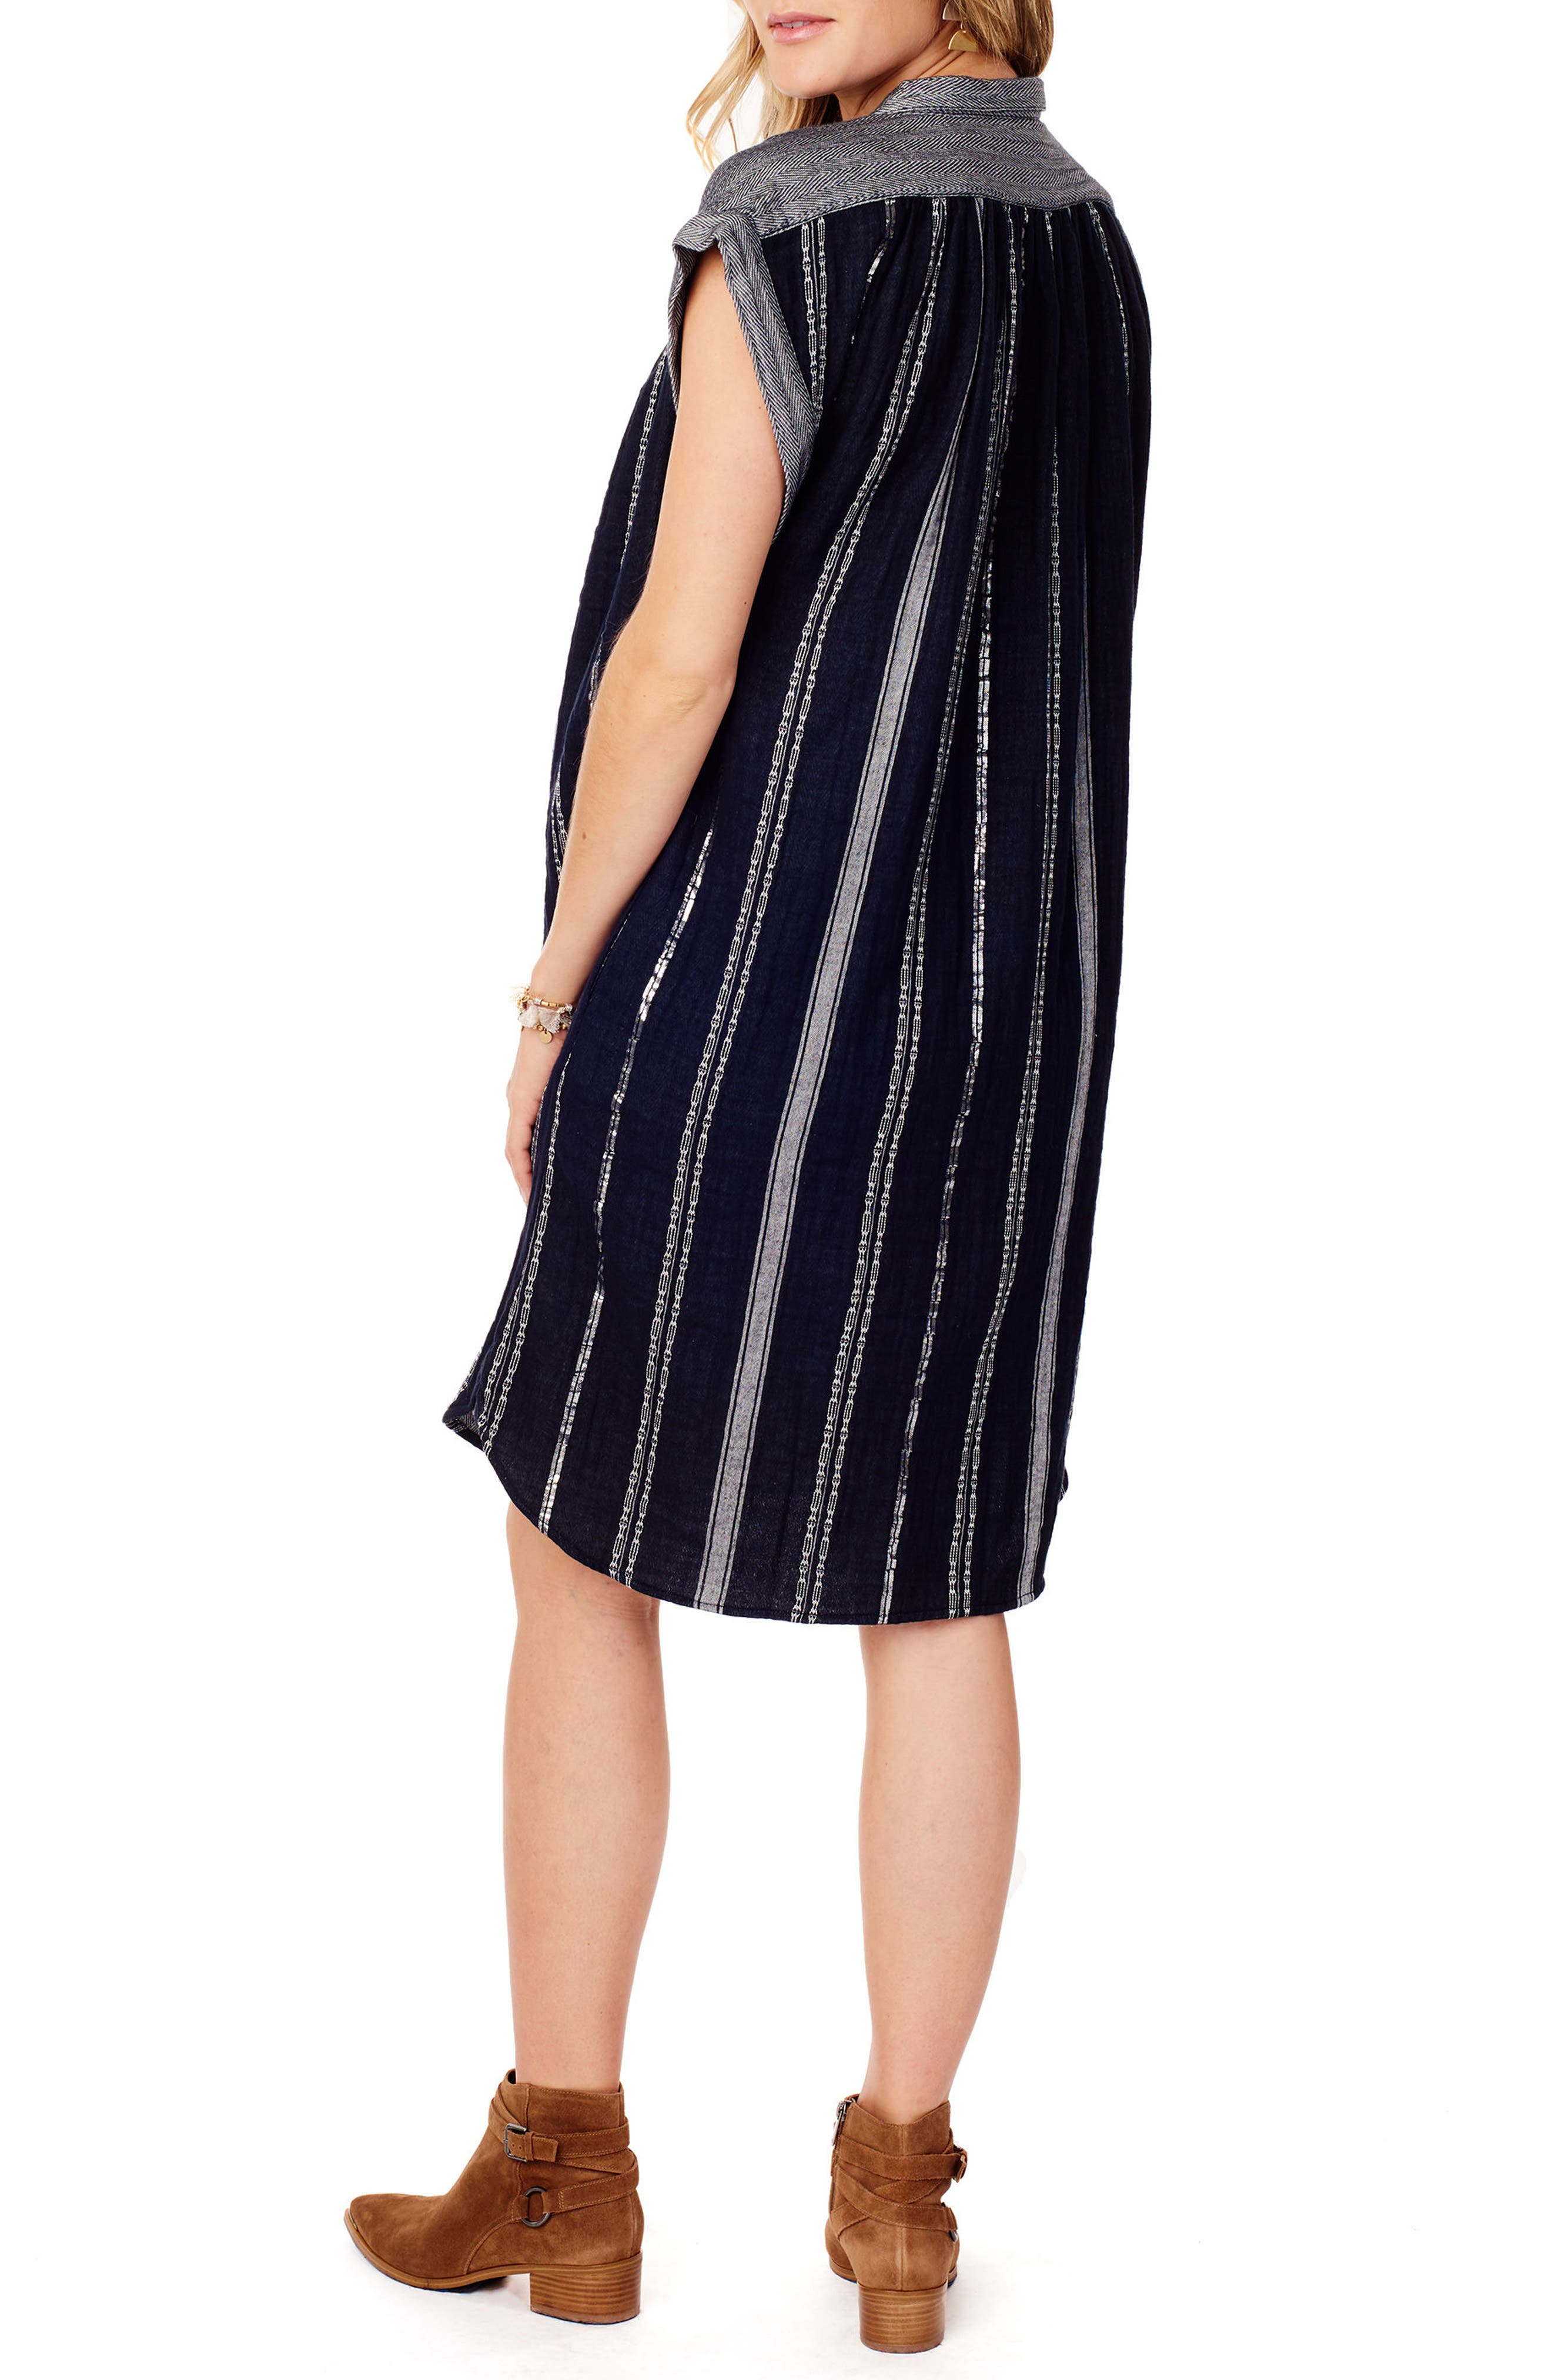 Ingrid & Isabel Maternity Shift Dress,                             Alternate thumbnail 2, color,                             True Navy Lurex Stripe